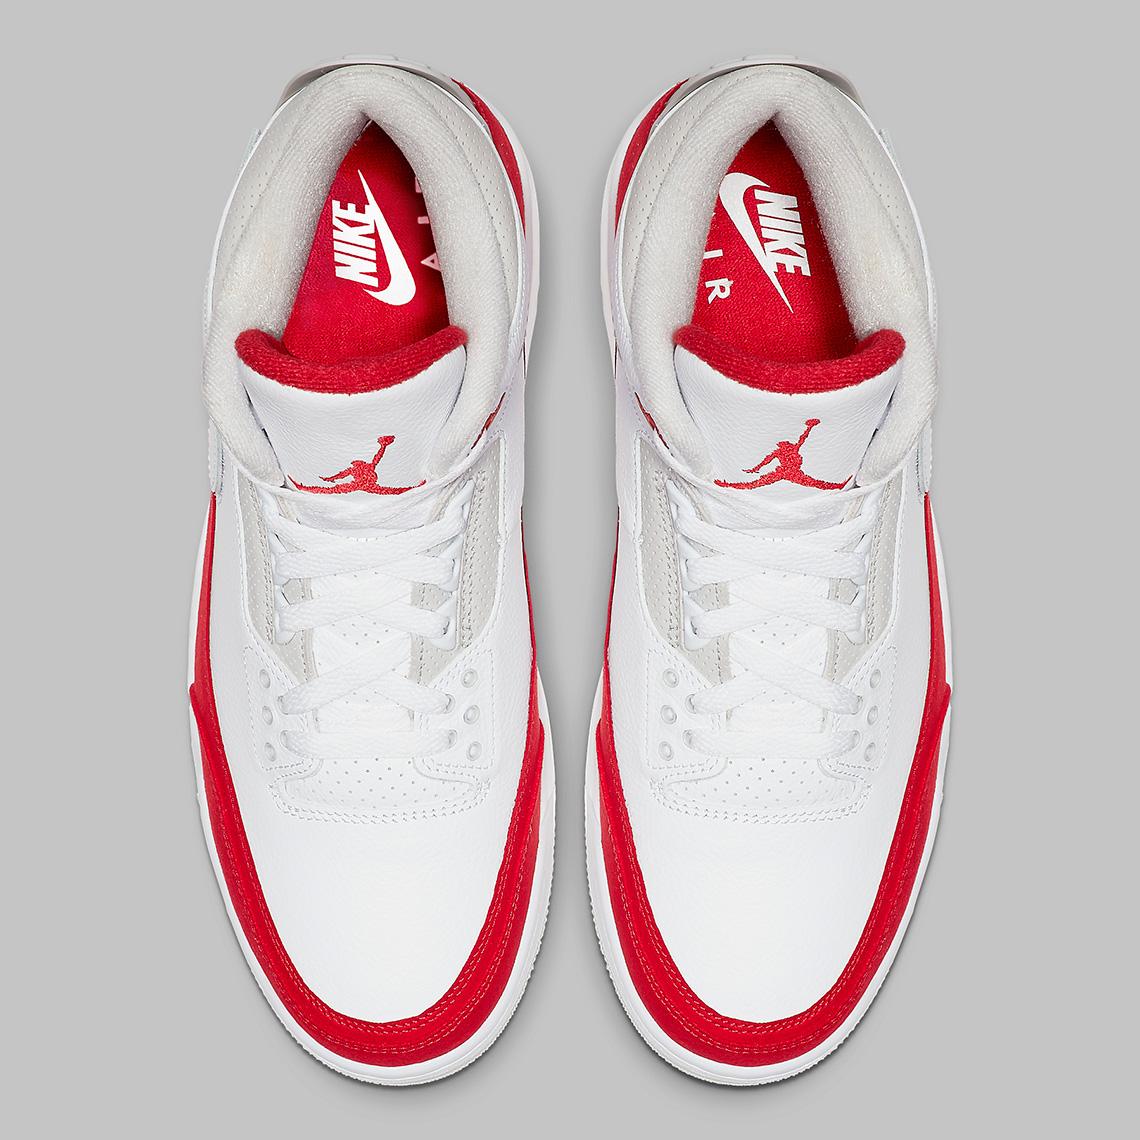 5cf32086182 Air Jordan 3 Tinker CJ0939-100 White University Red Release Date ...